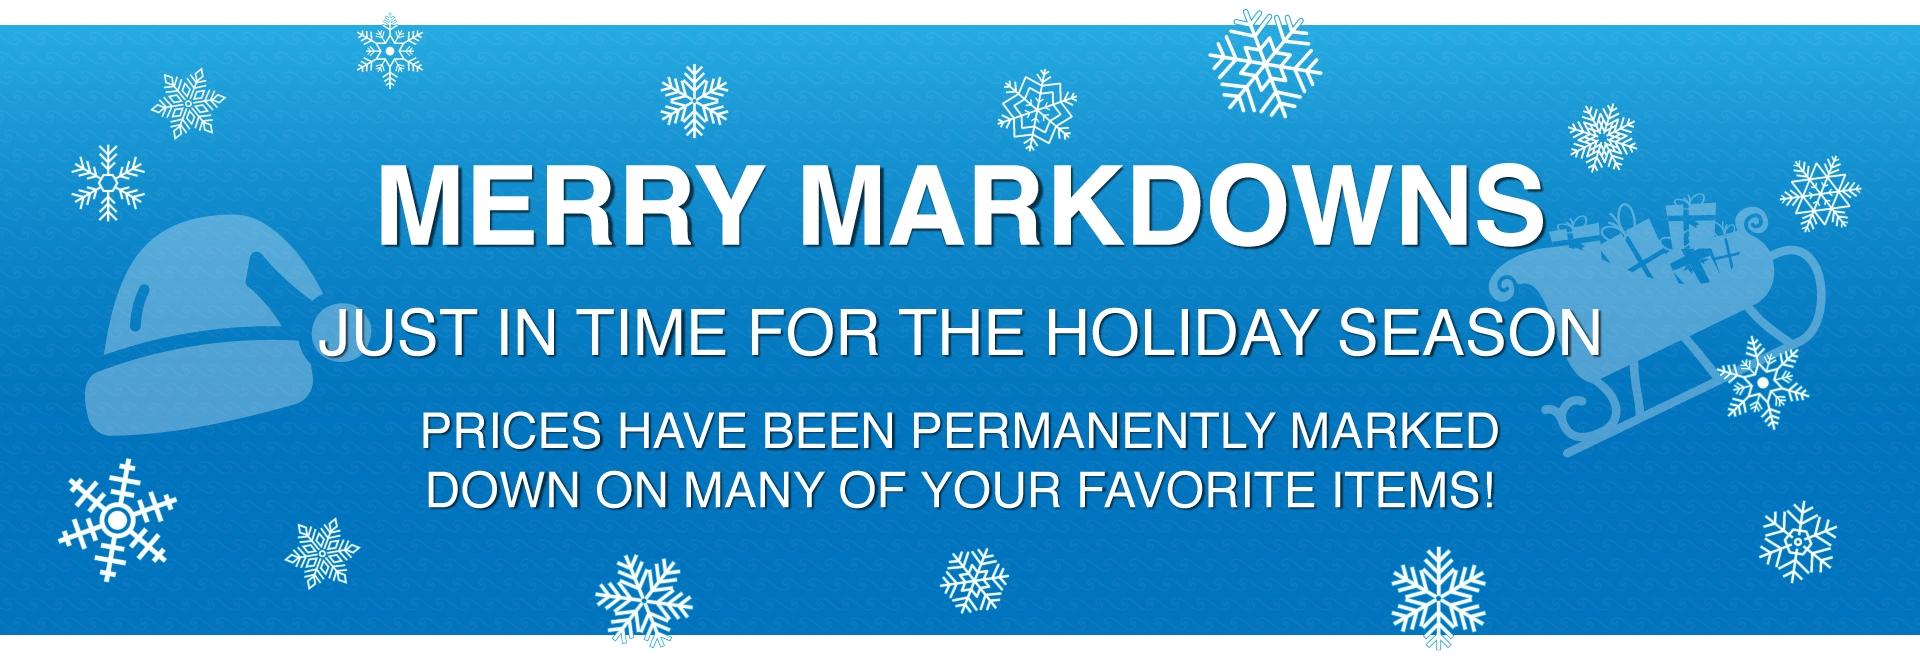 MerryMarkdowns